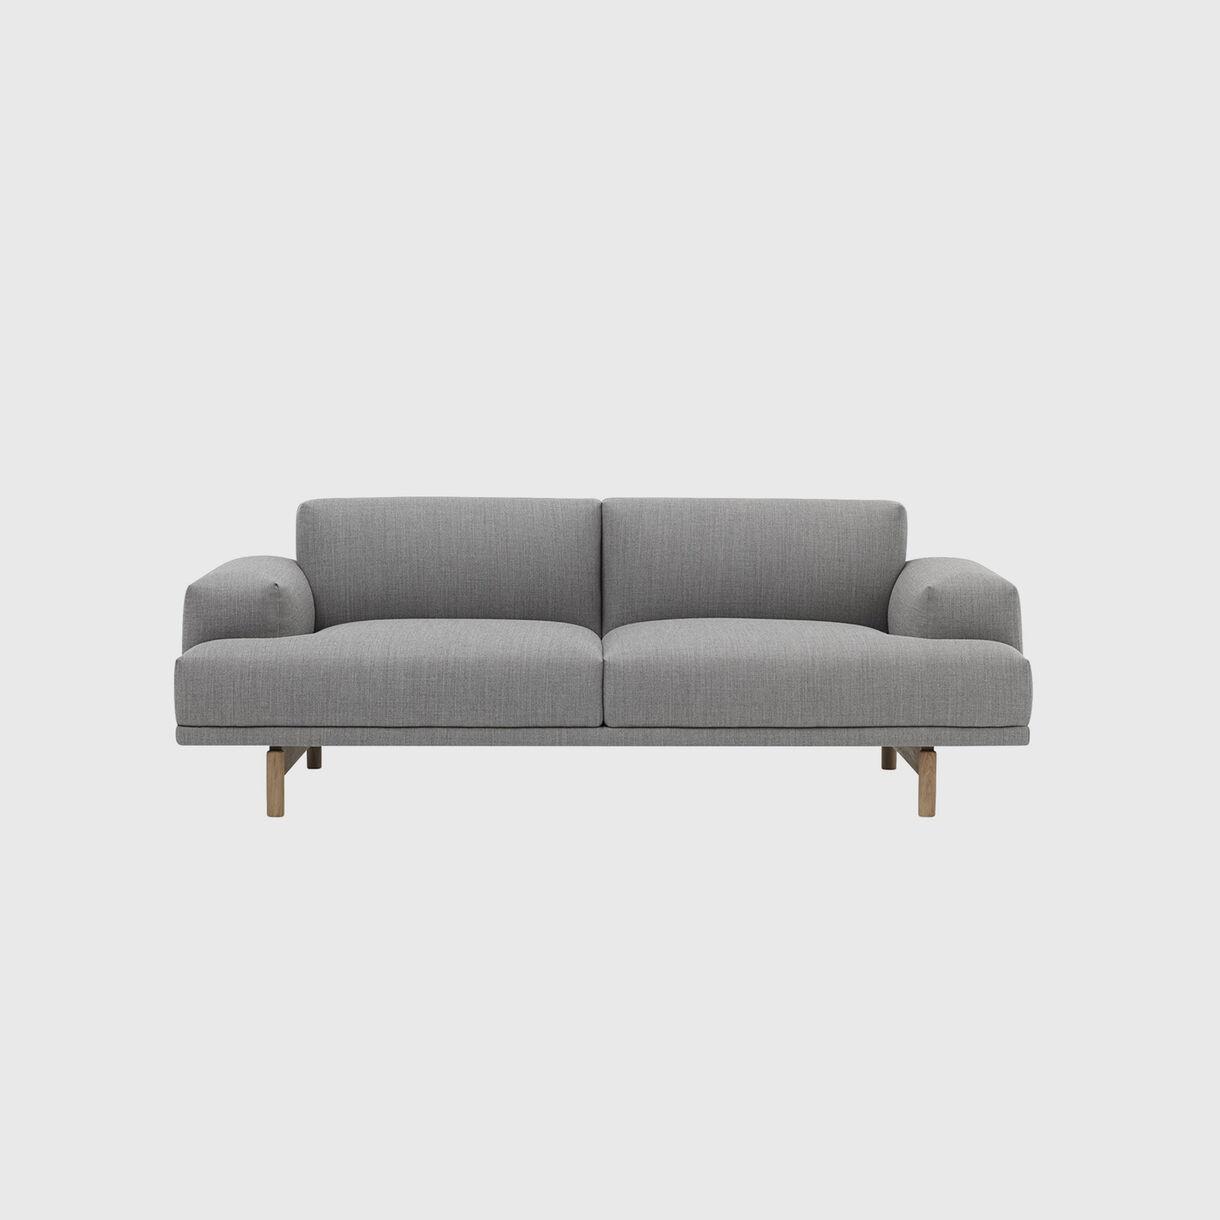 Compose Sofa, 2 Seater, Fiord 151